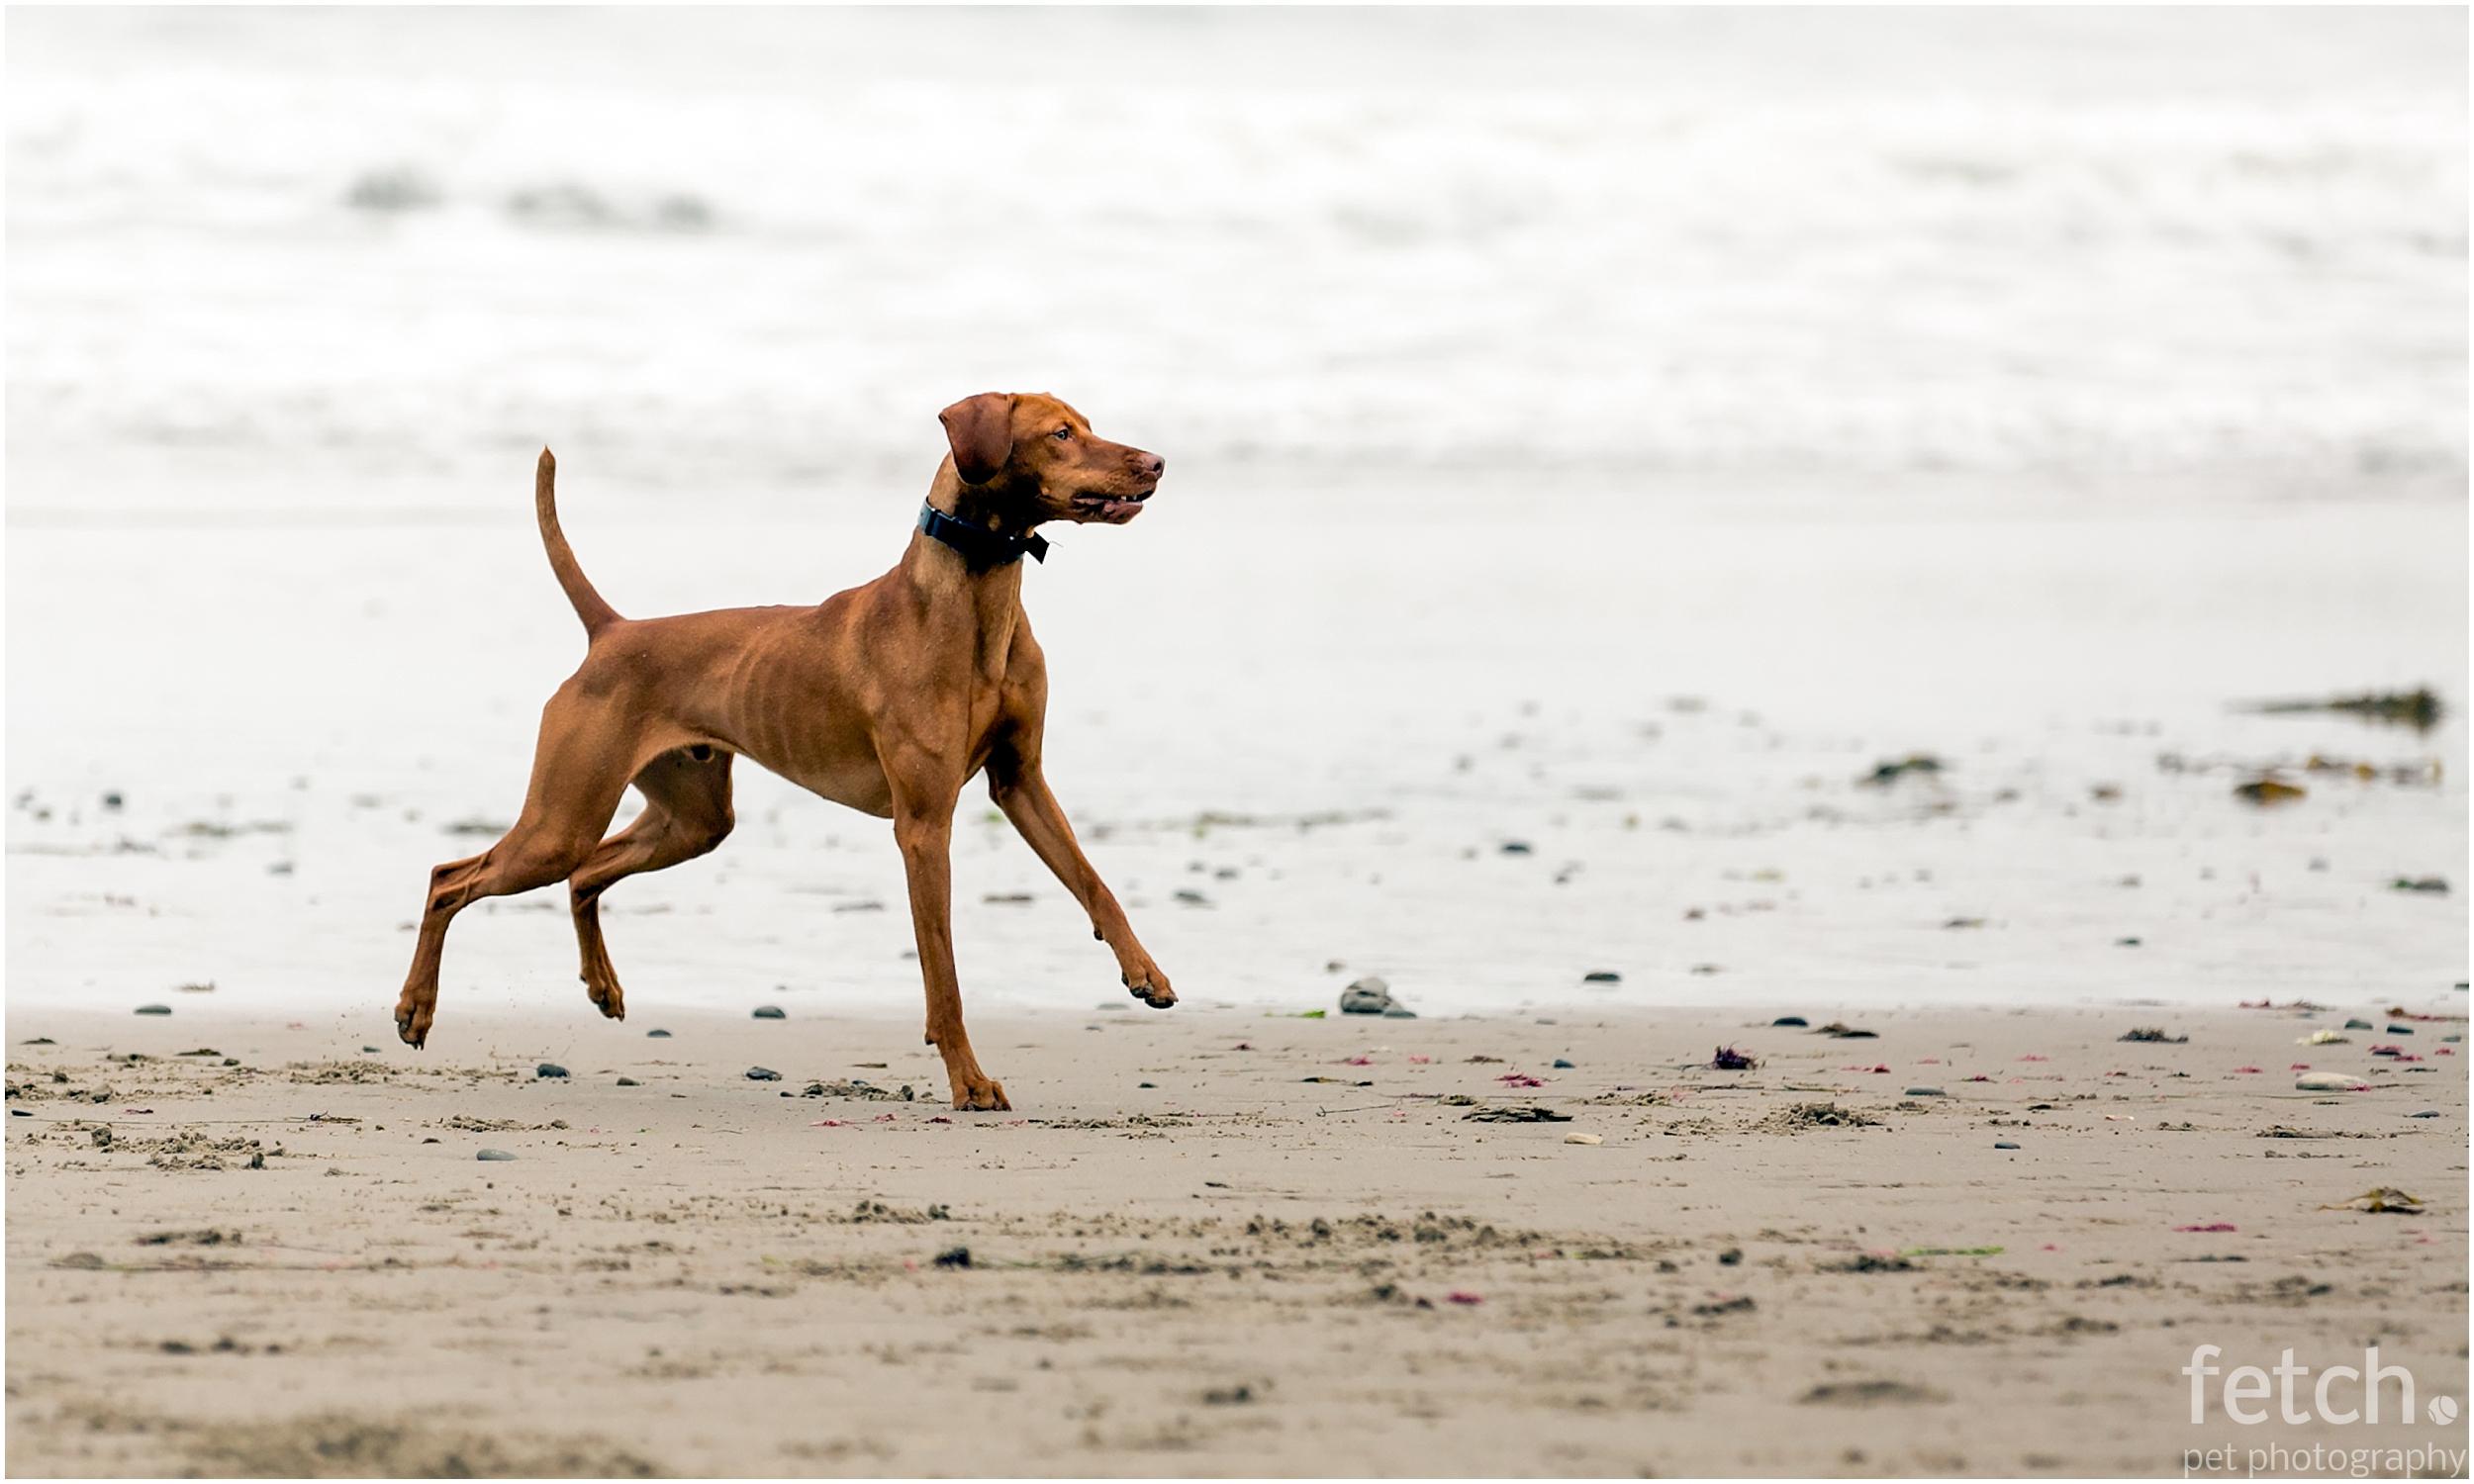 vizsla-chases-ball-at-dog-beach